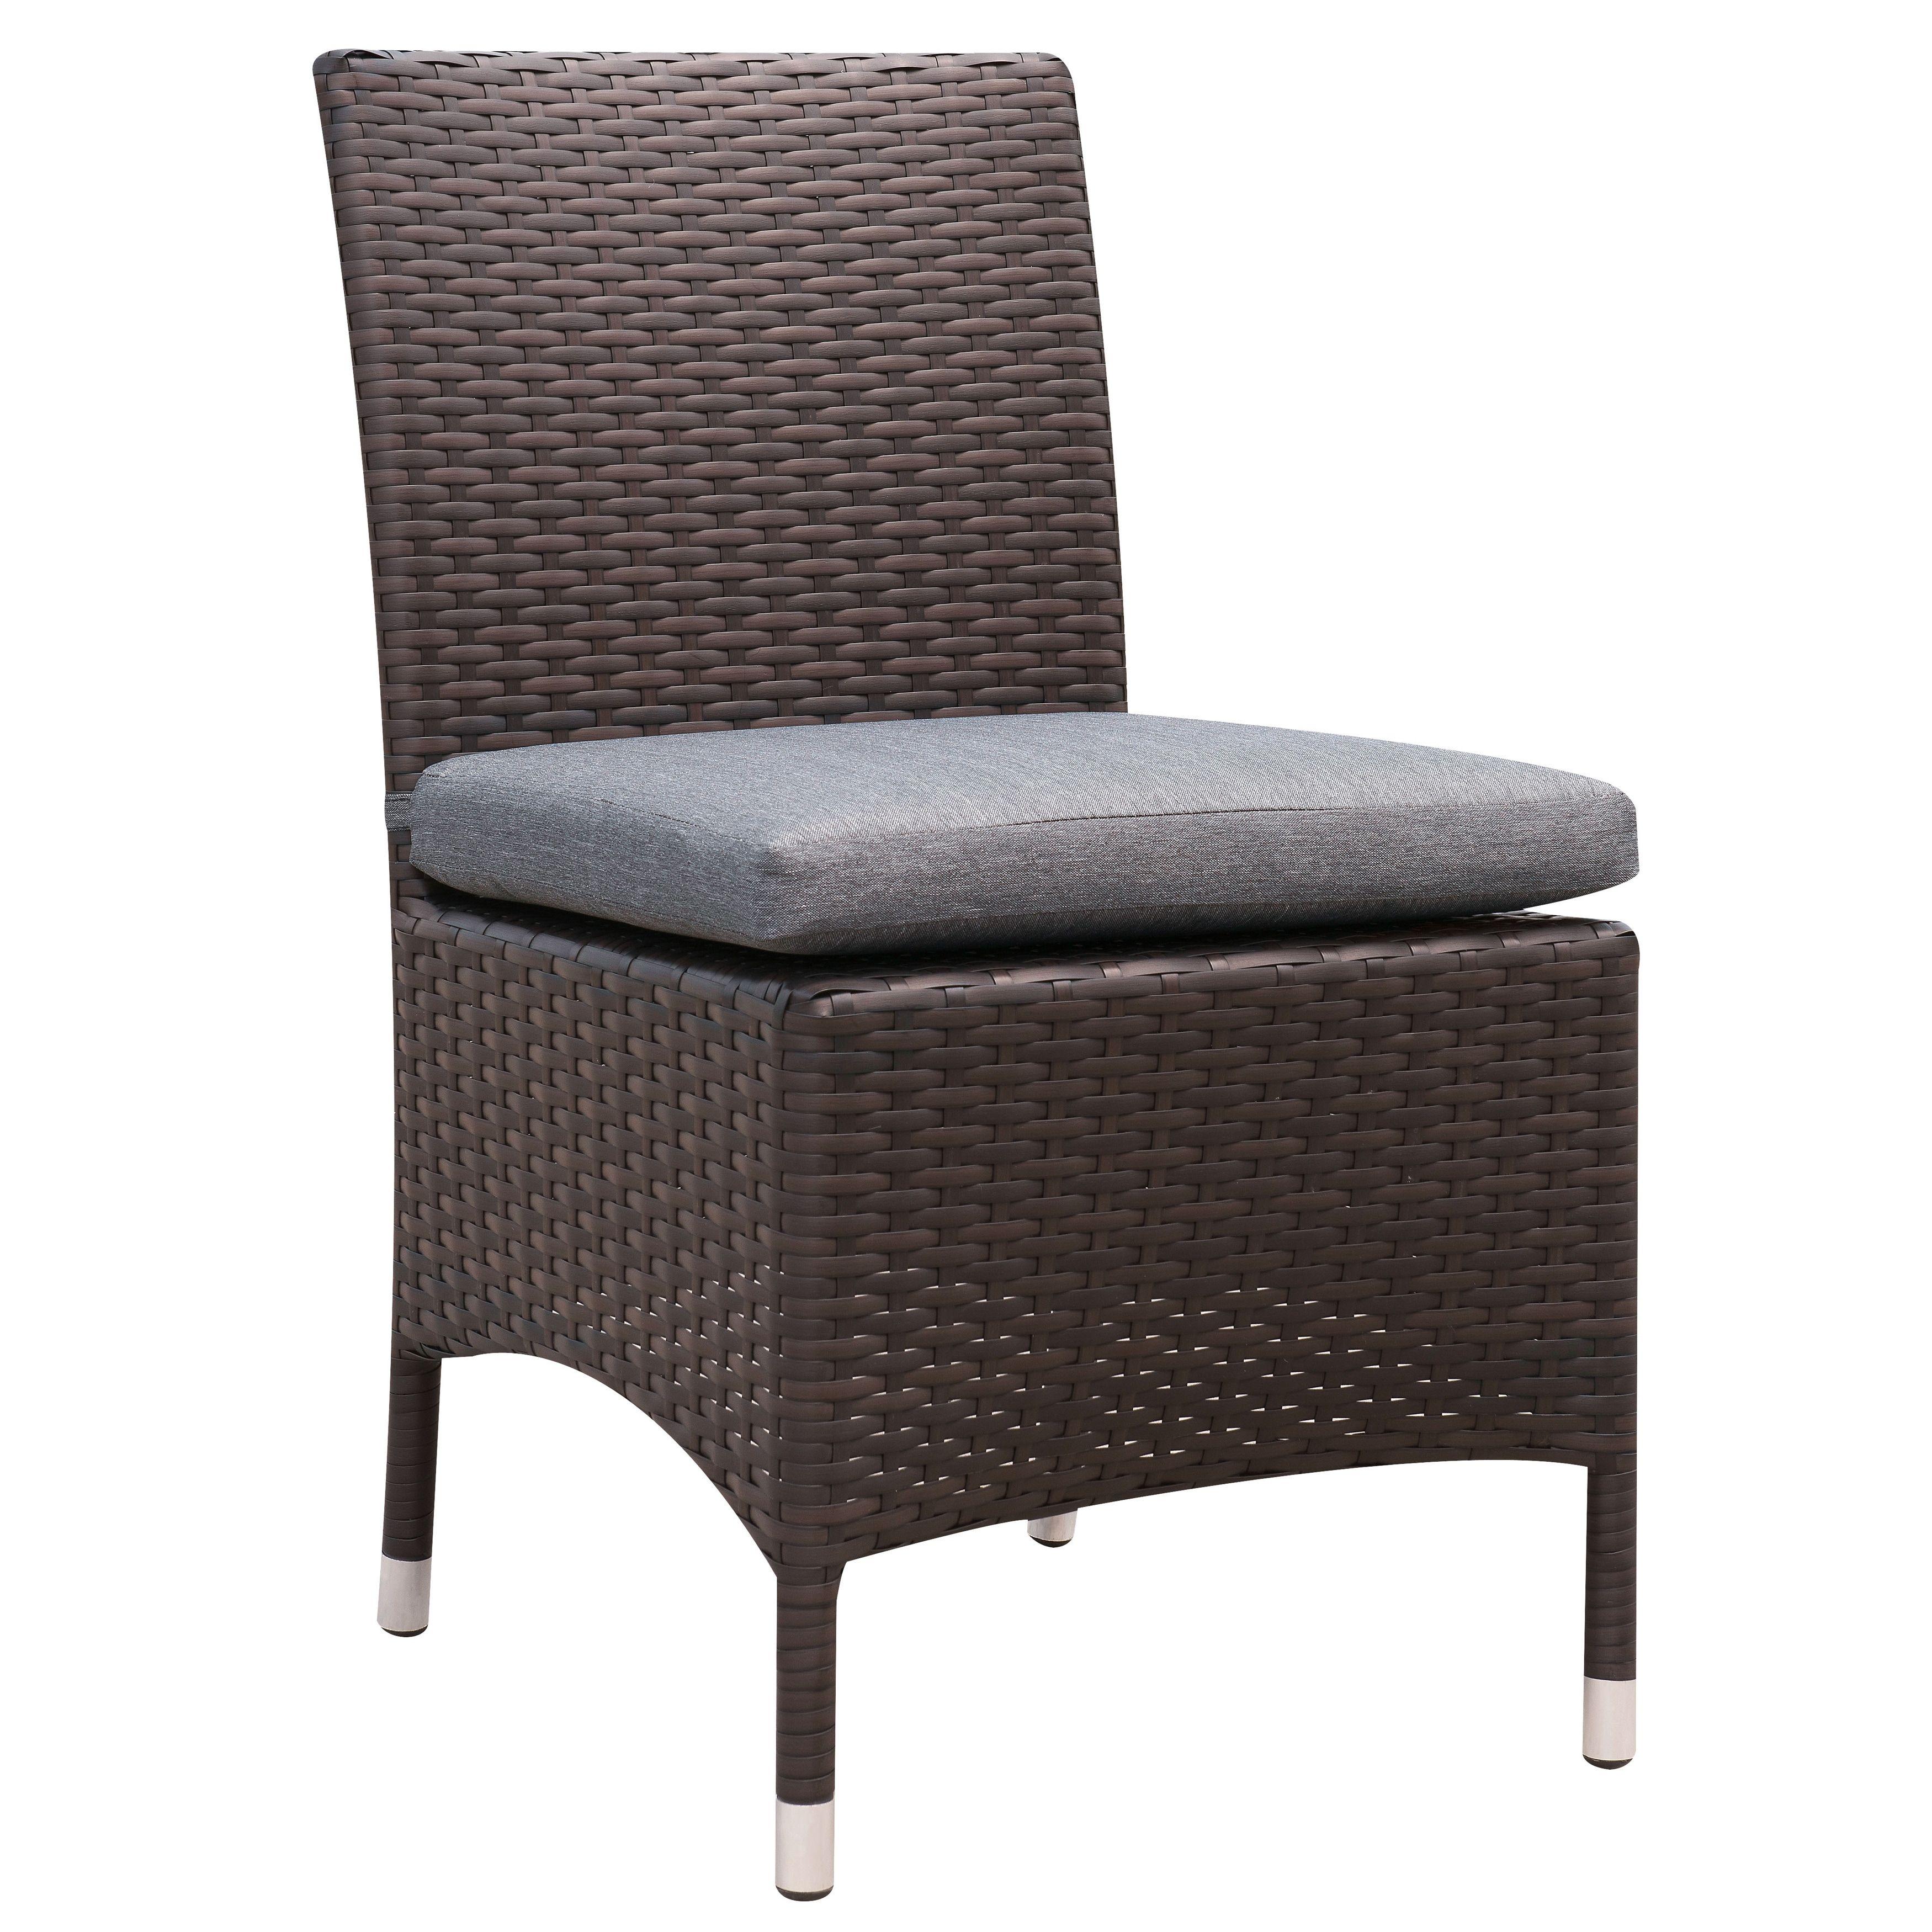 Furniture Of America Mianne Espresso Wicker Inspired Patio Chair